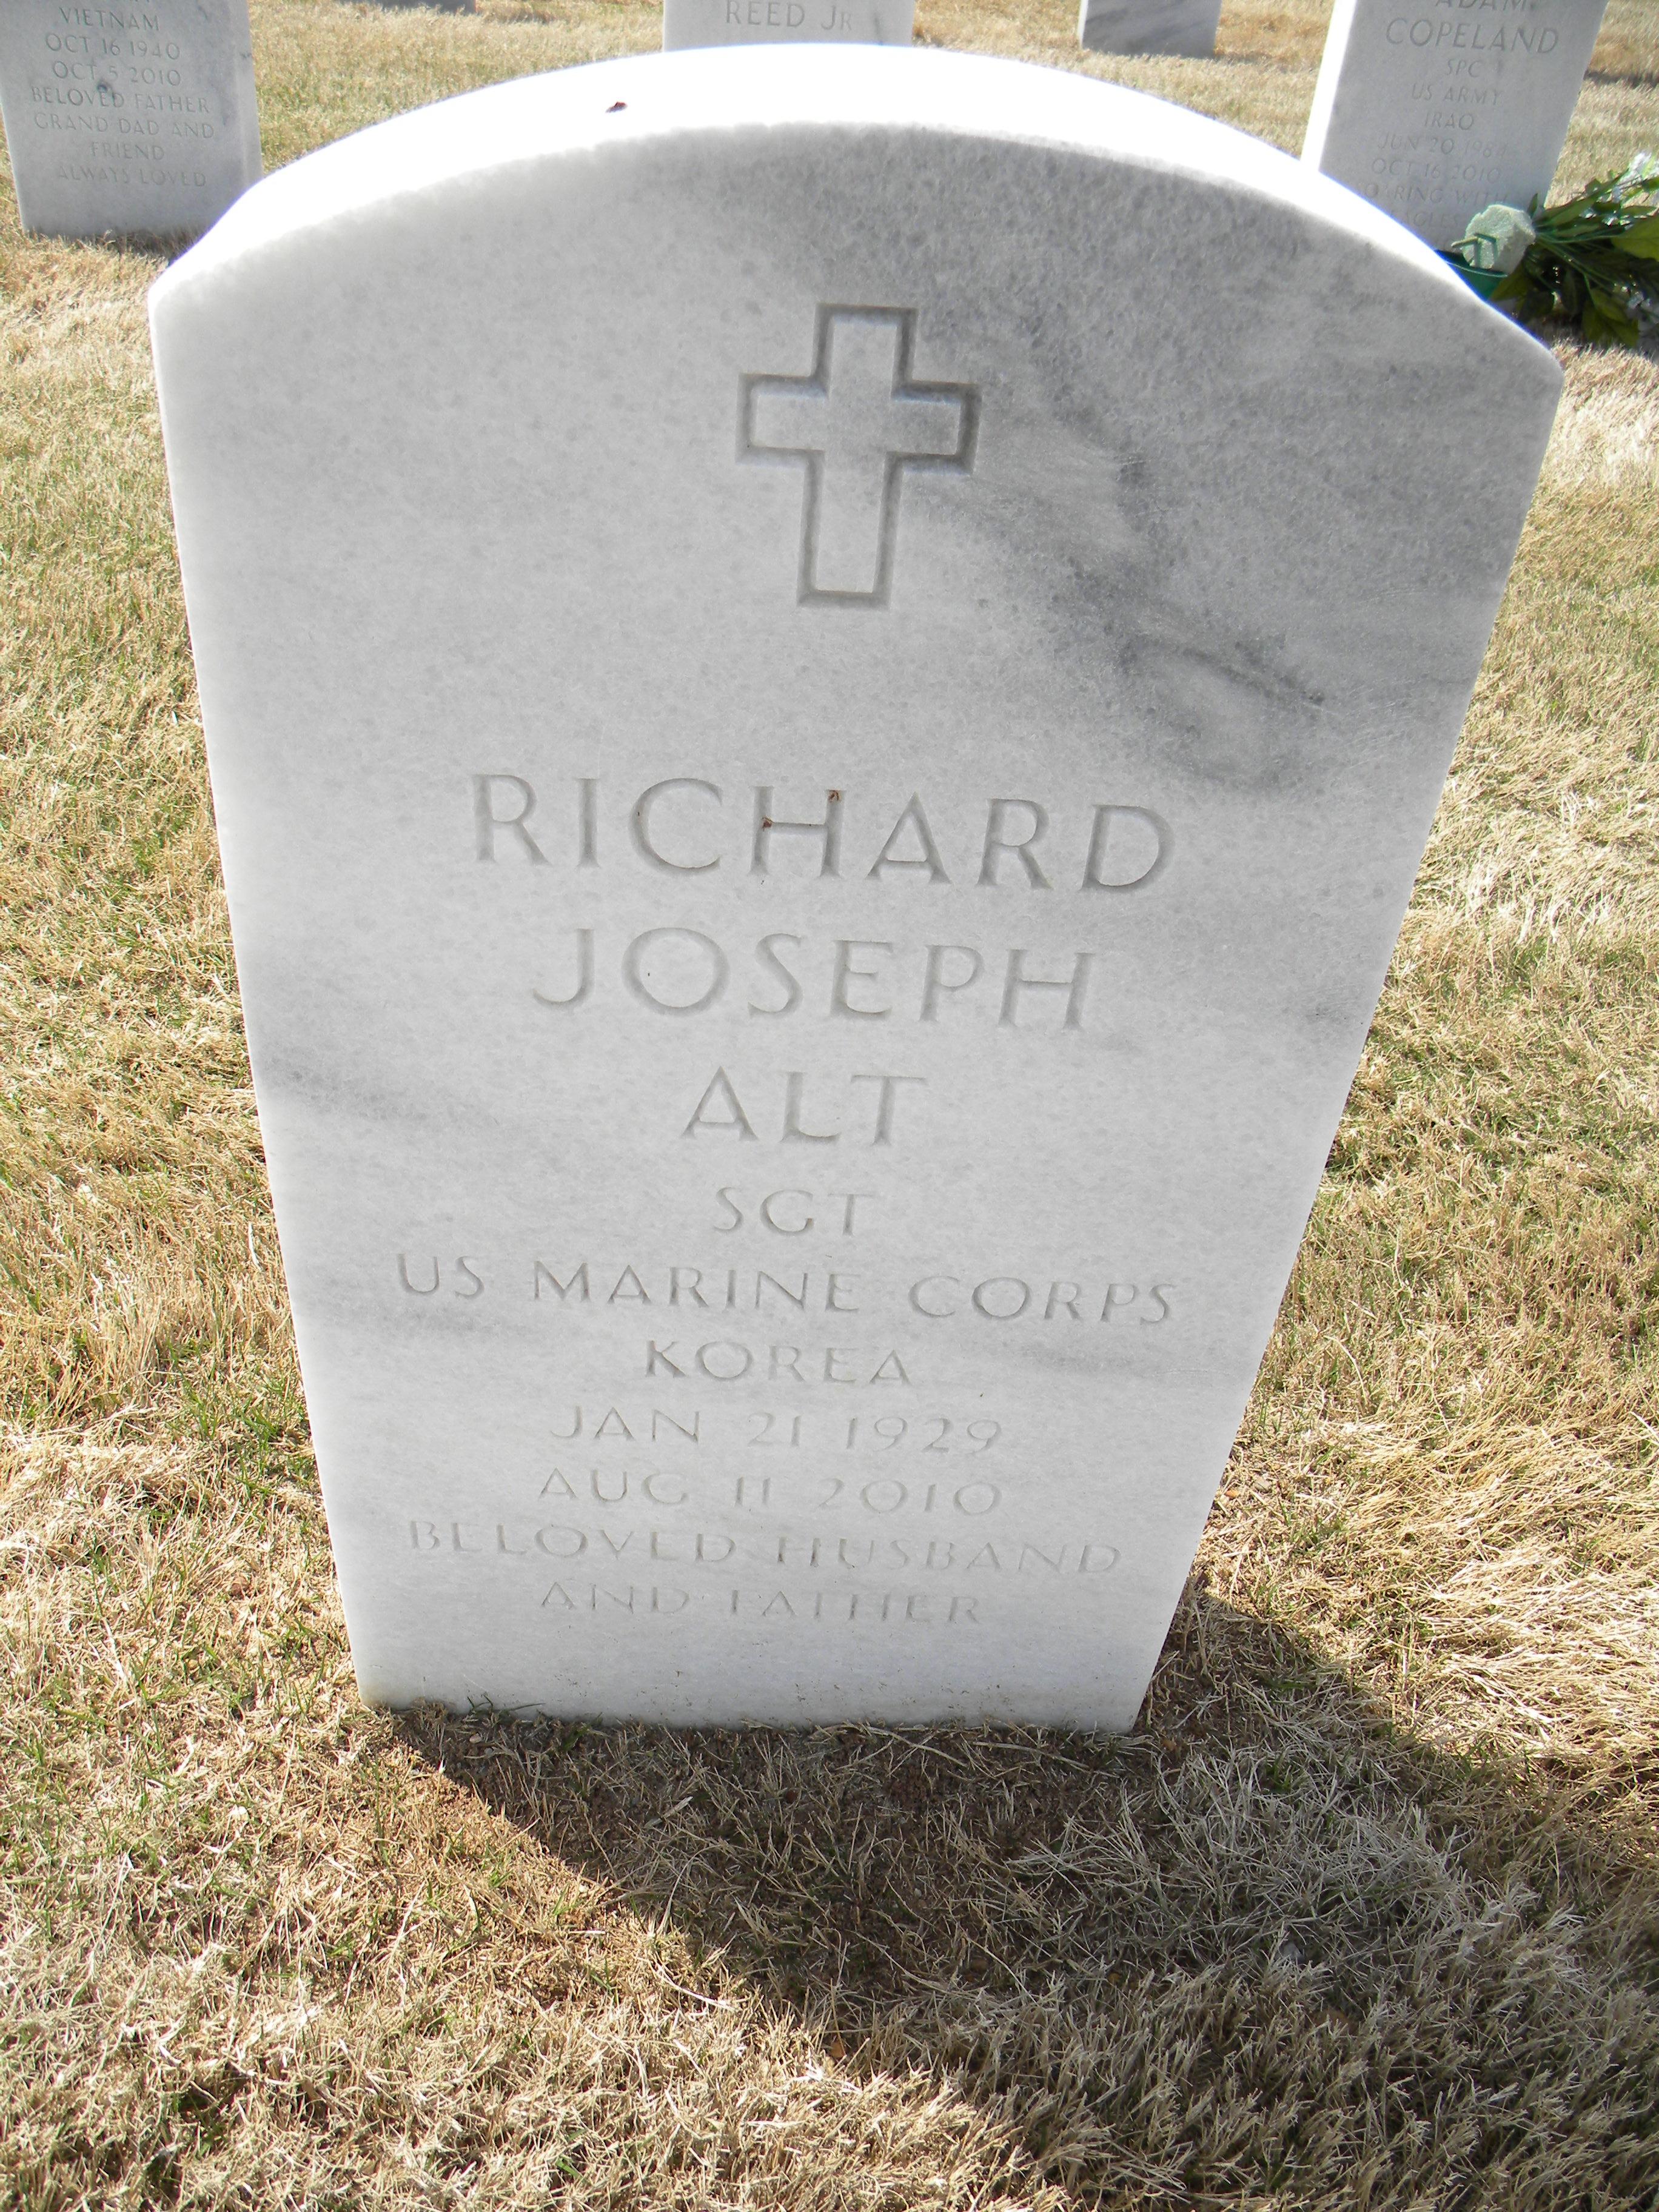 Sgt Richard Joseph Alt